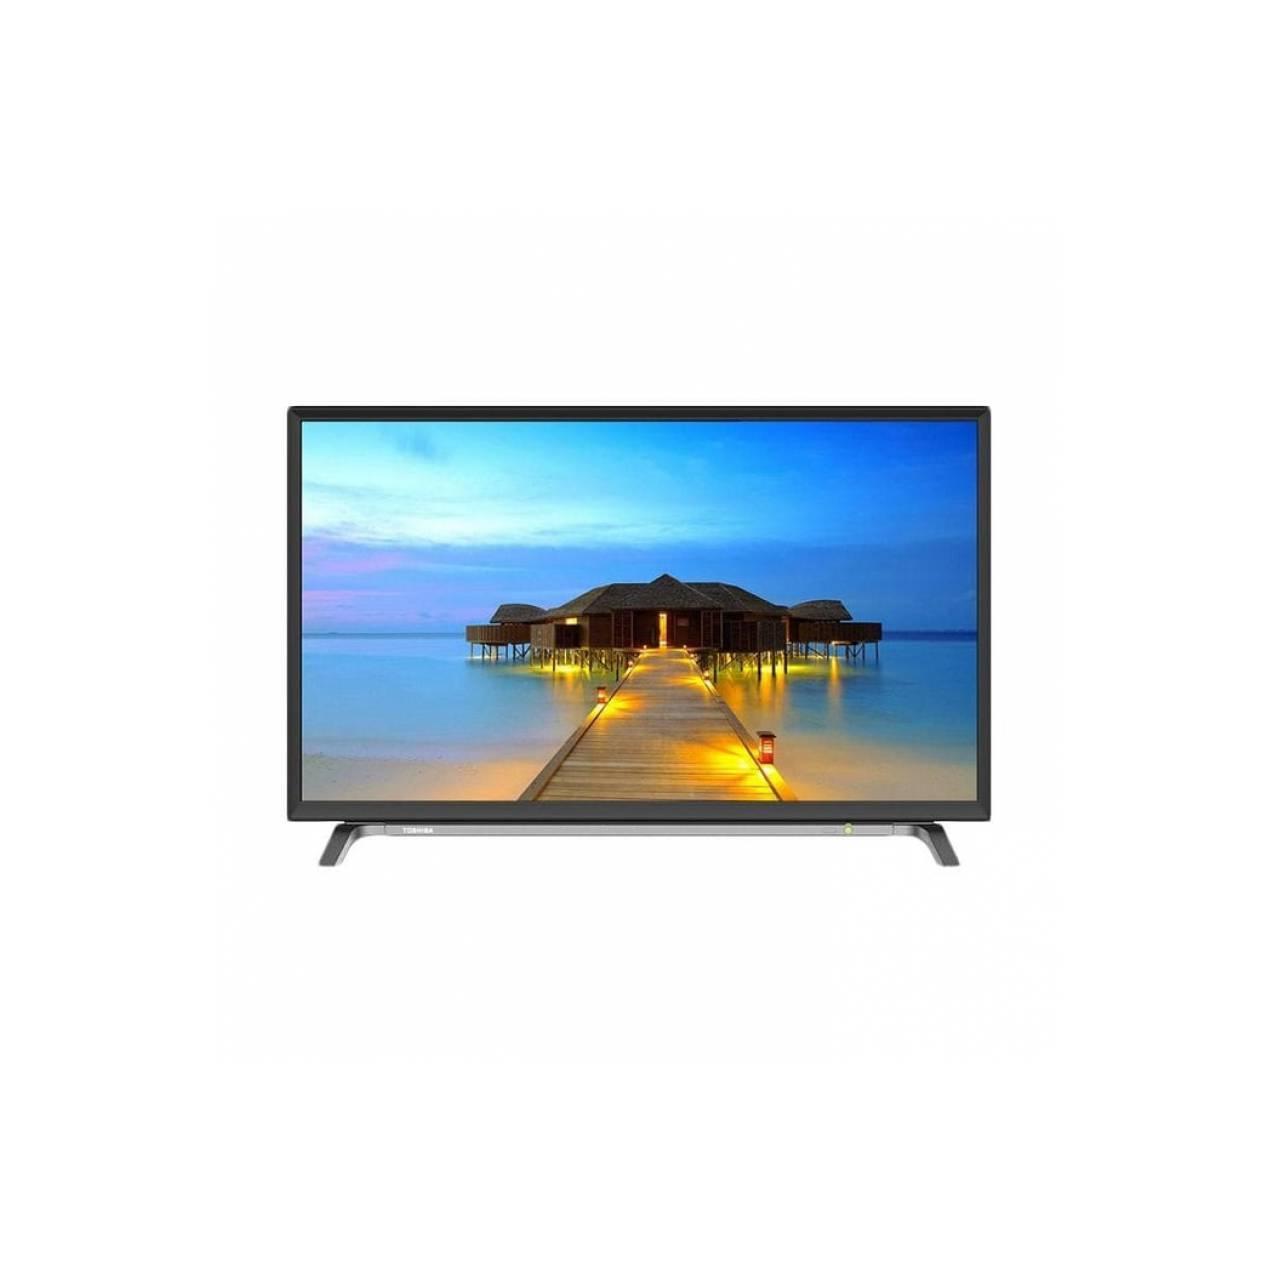 Samsung Hd Led Tv 24 24h4150 Free Bracket Tv 2x Hdmi 2x Usb .